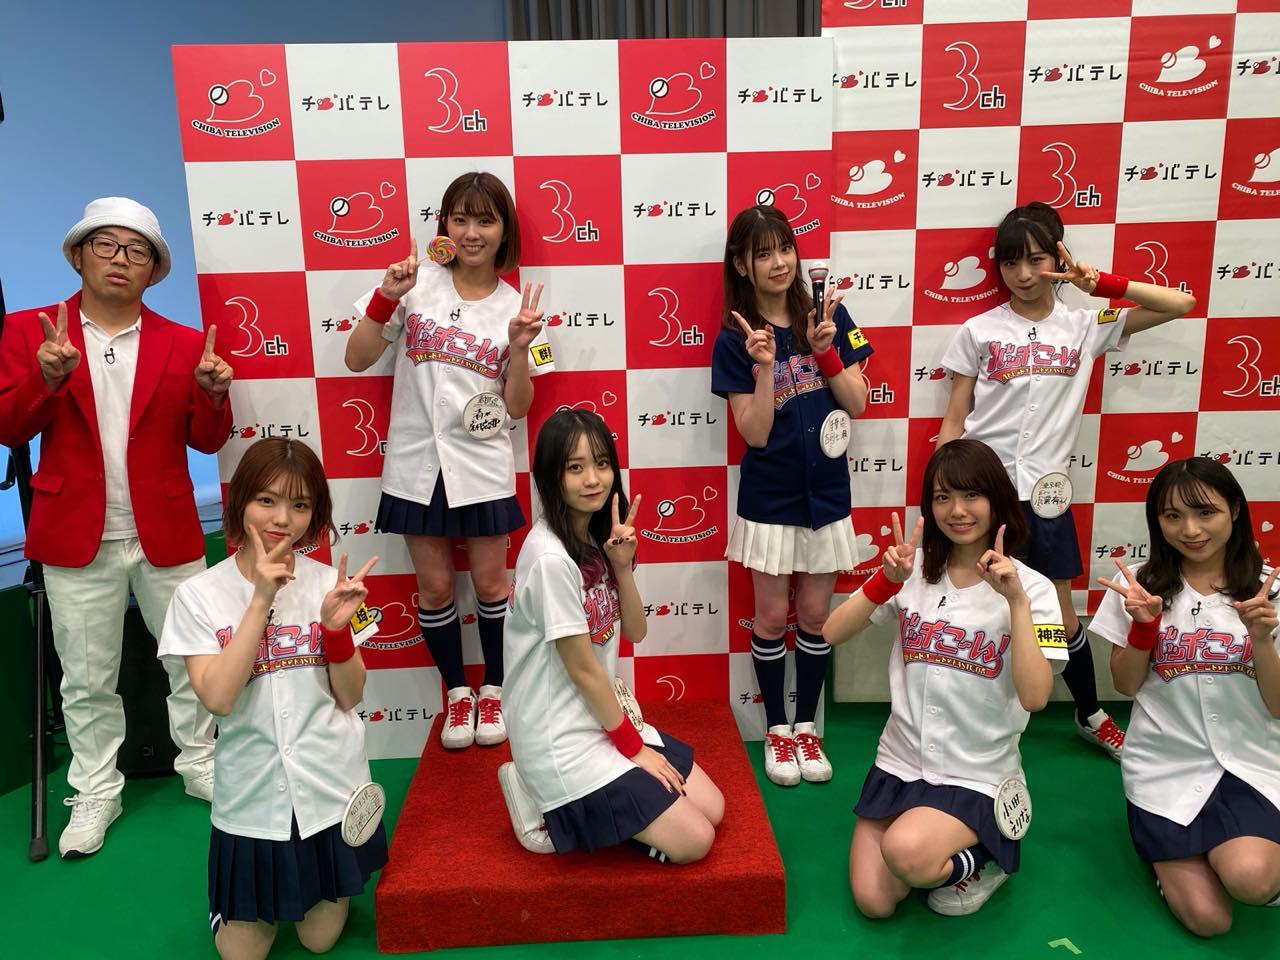 「AKB48チーム8のKANTO白書 バッチこーい!」#75:バッチバチ! フォトジェニック選手権!【チバテレ】